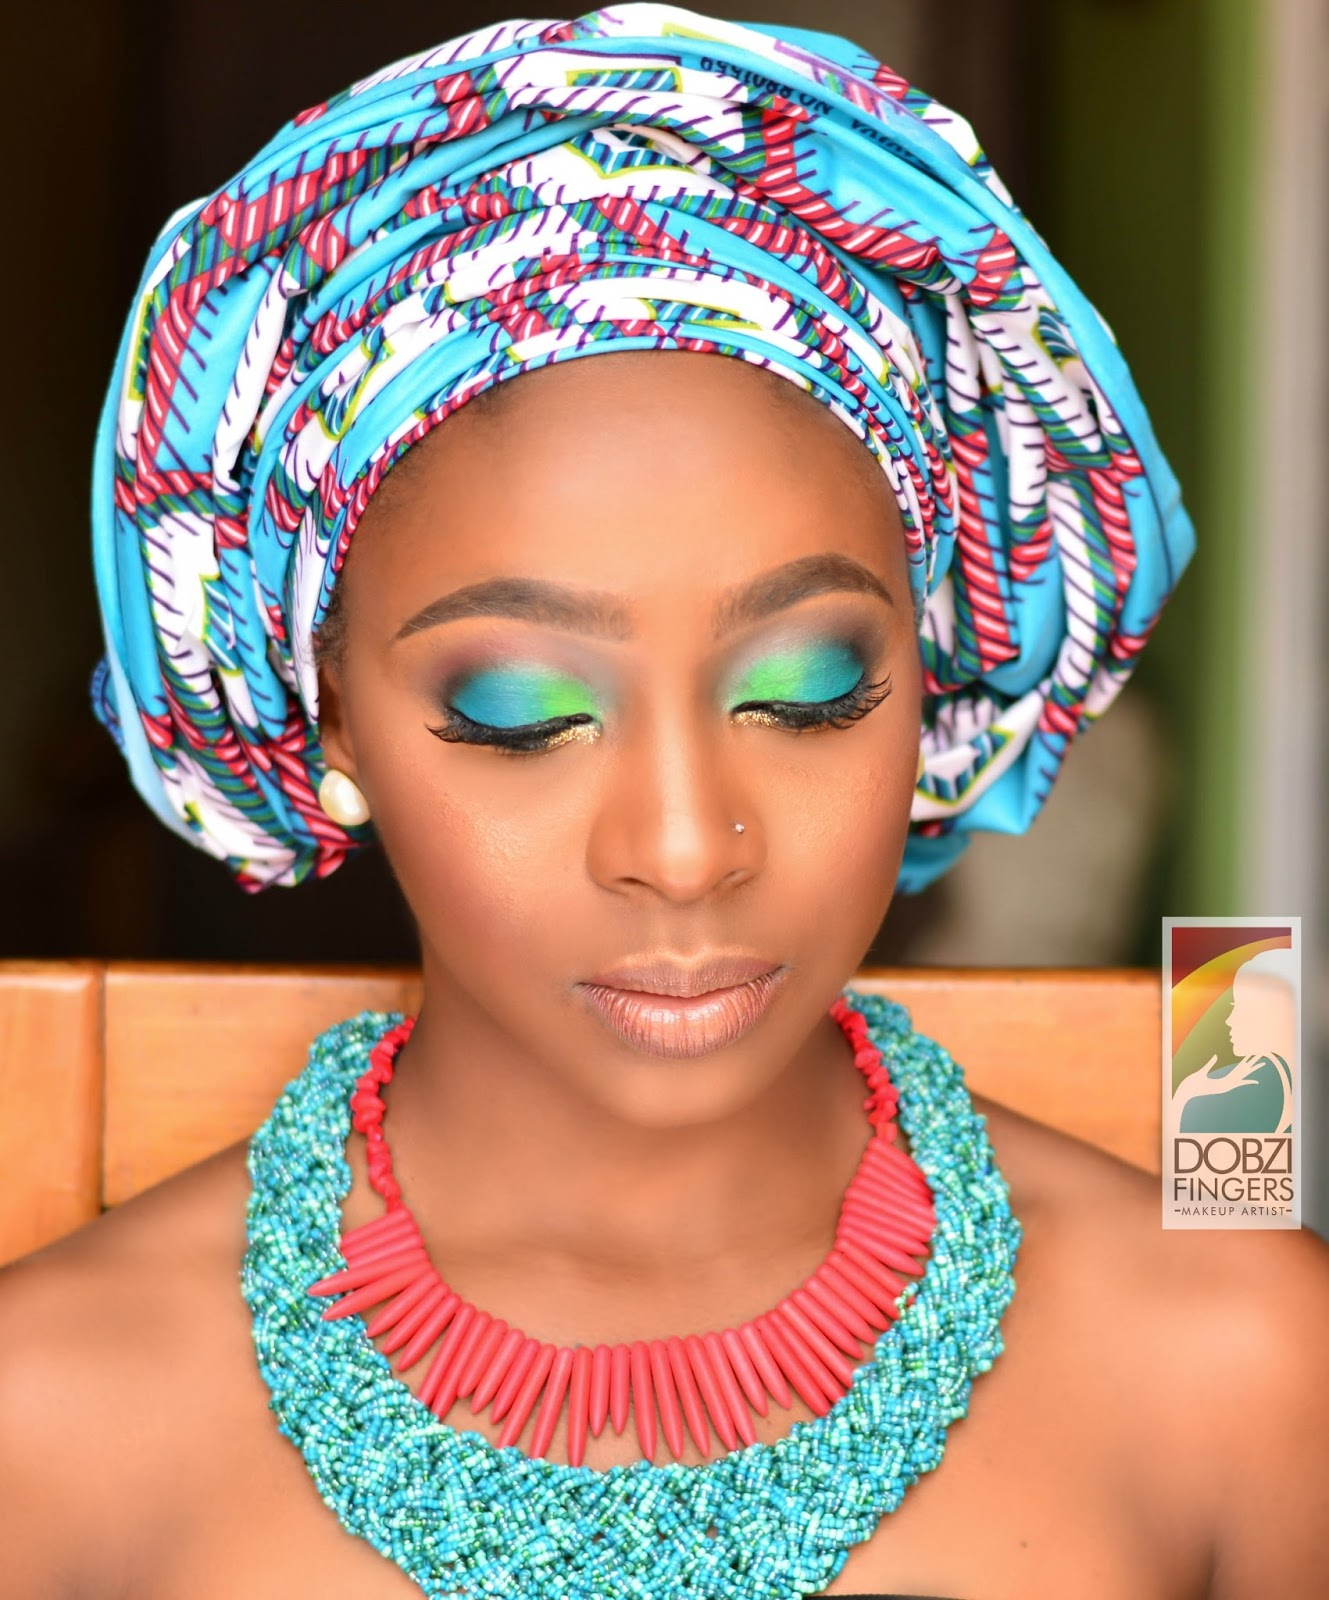 Dobzi Fingers - Ankara Inspired Makeup, Nigerian Makeup Artist